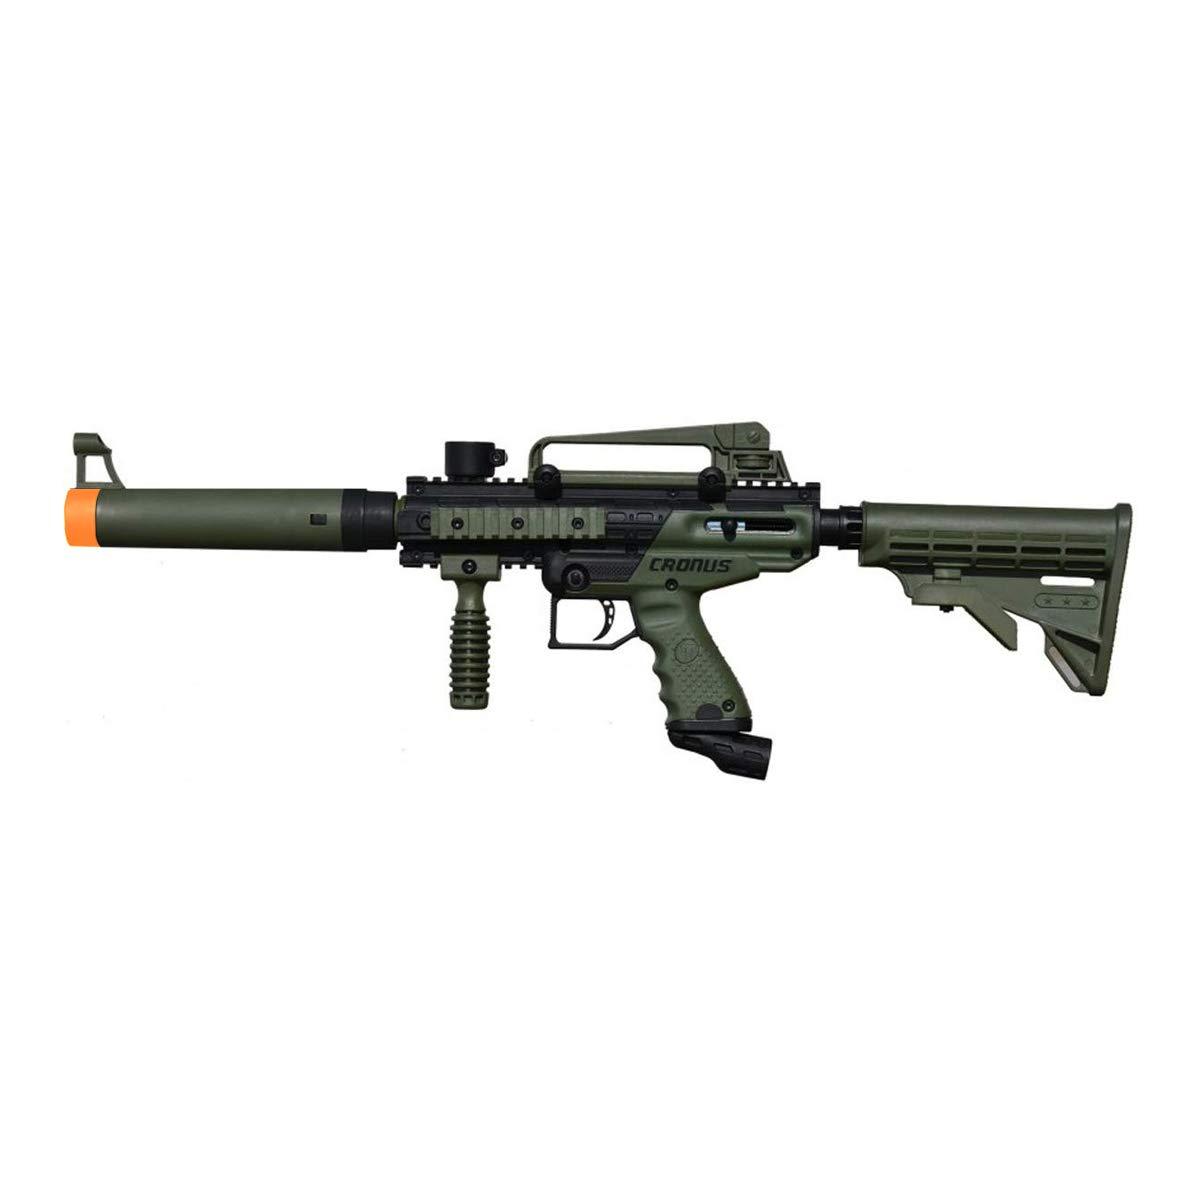 Tippmann Cronus Tactical Paintball Gun